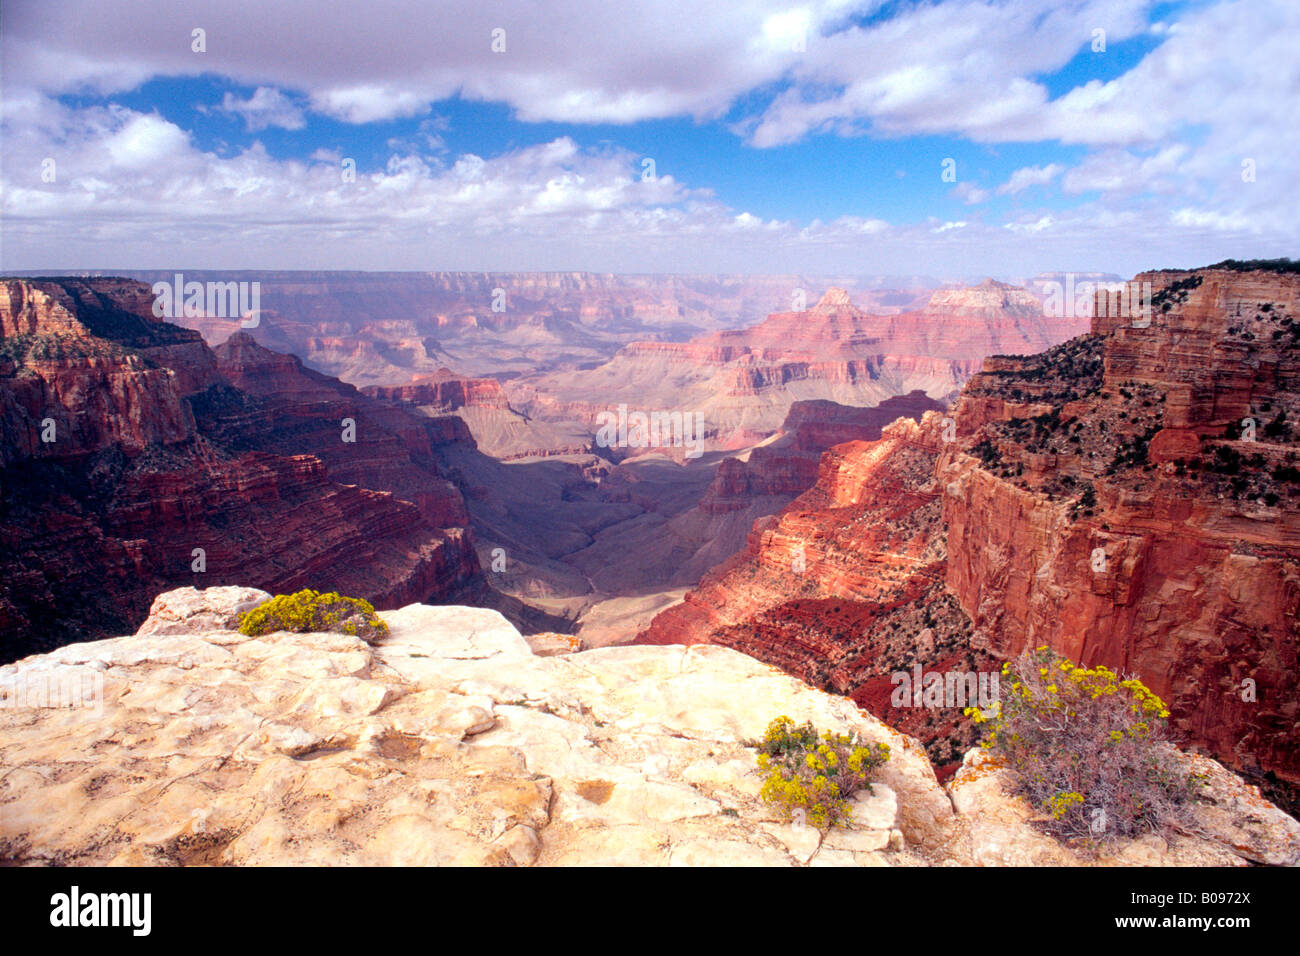 Cape Royal, North Rim of the Grand Canyon, Grand Canyon National Park, Arizona, USA, North America Stock Photo